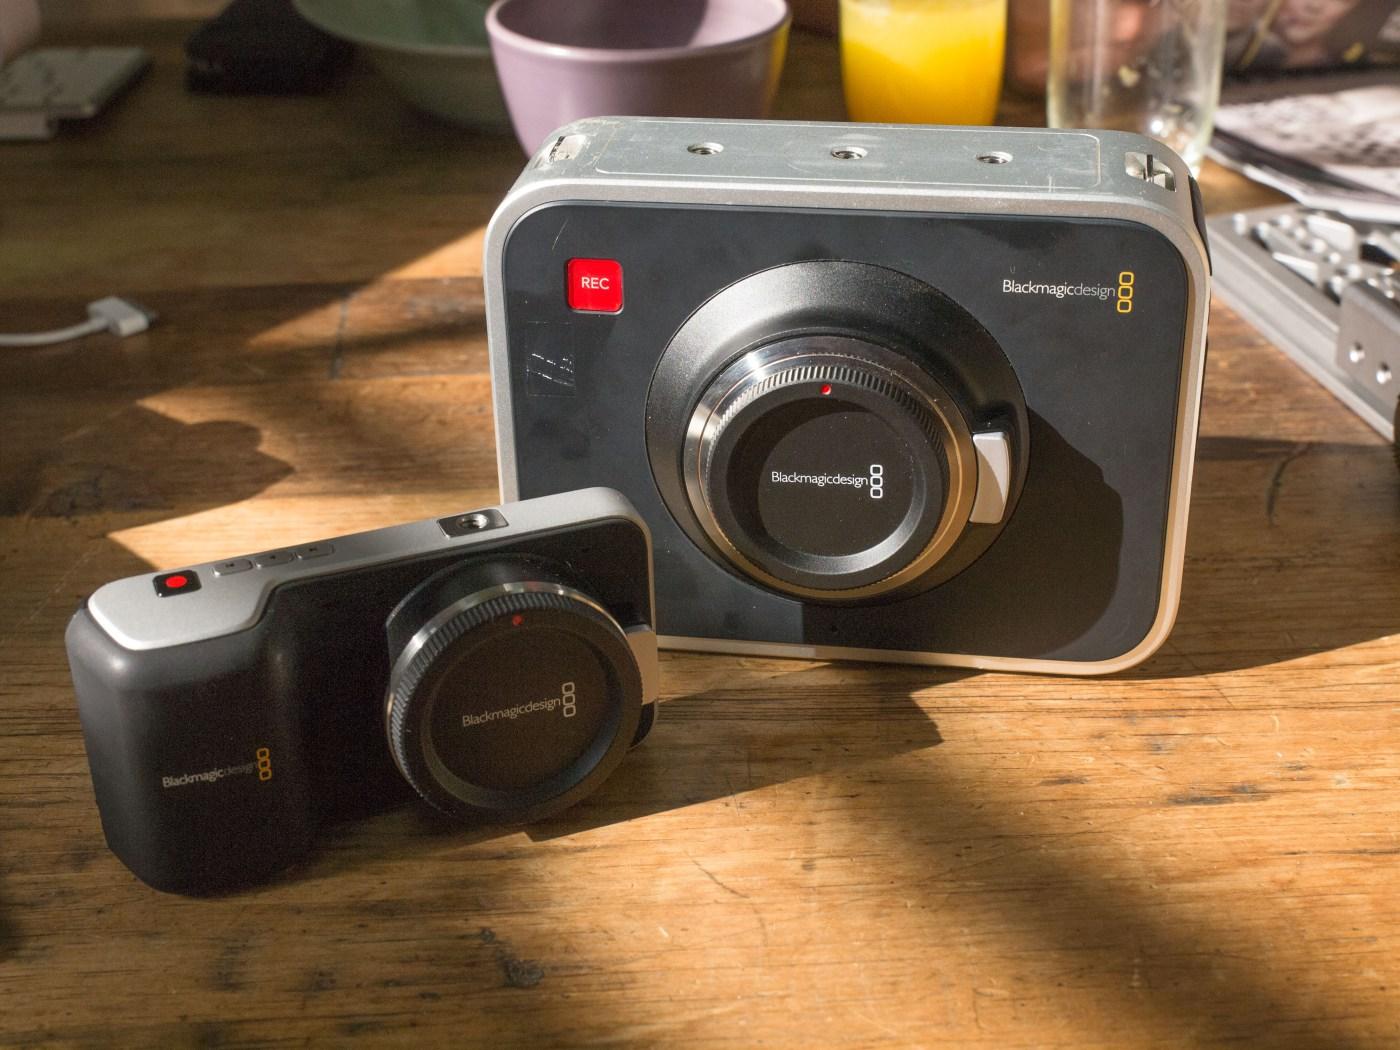 Formidable Olympus Digital Camera Nab Have Blackmagic Made Ir Own Camera Obsolete By Ir Student Rec Cameras dpreview Student Rec Cameras